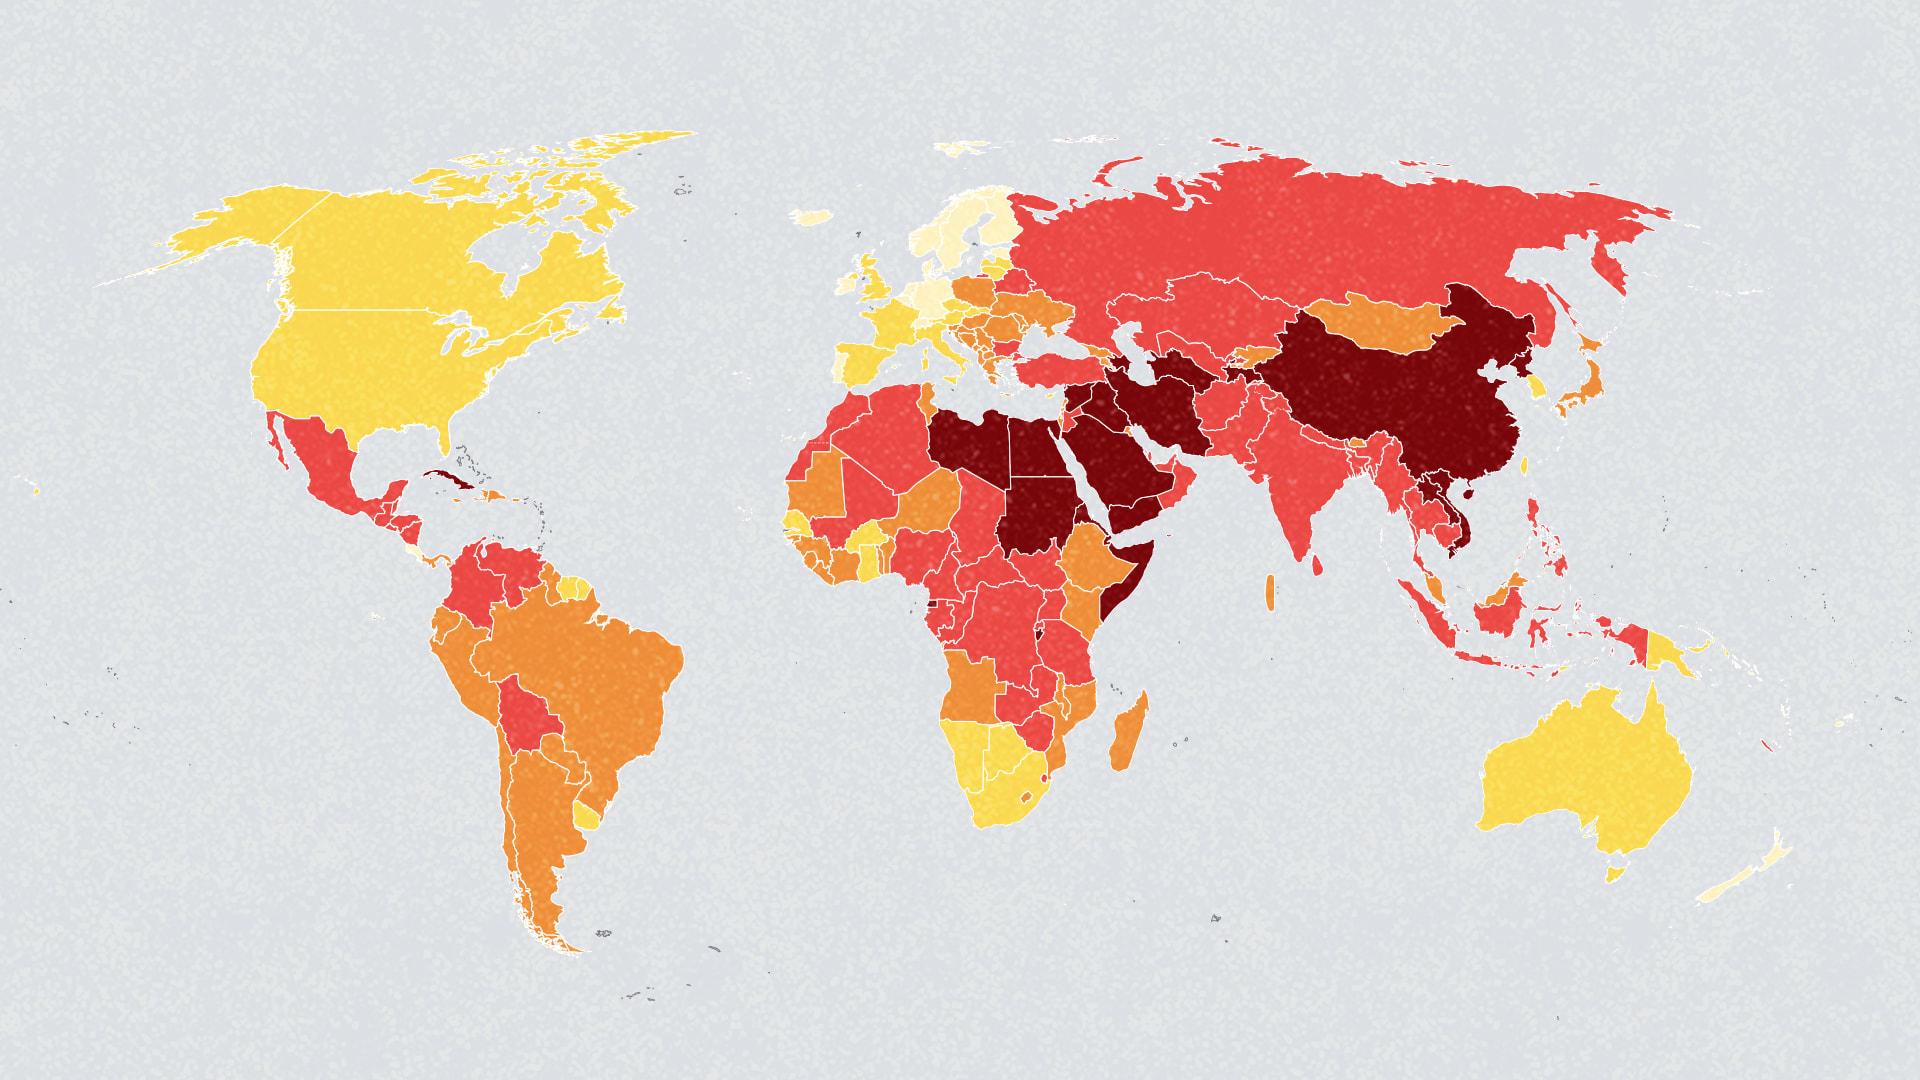 World press freedom